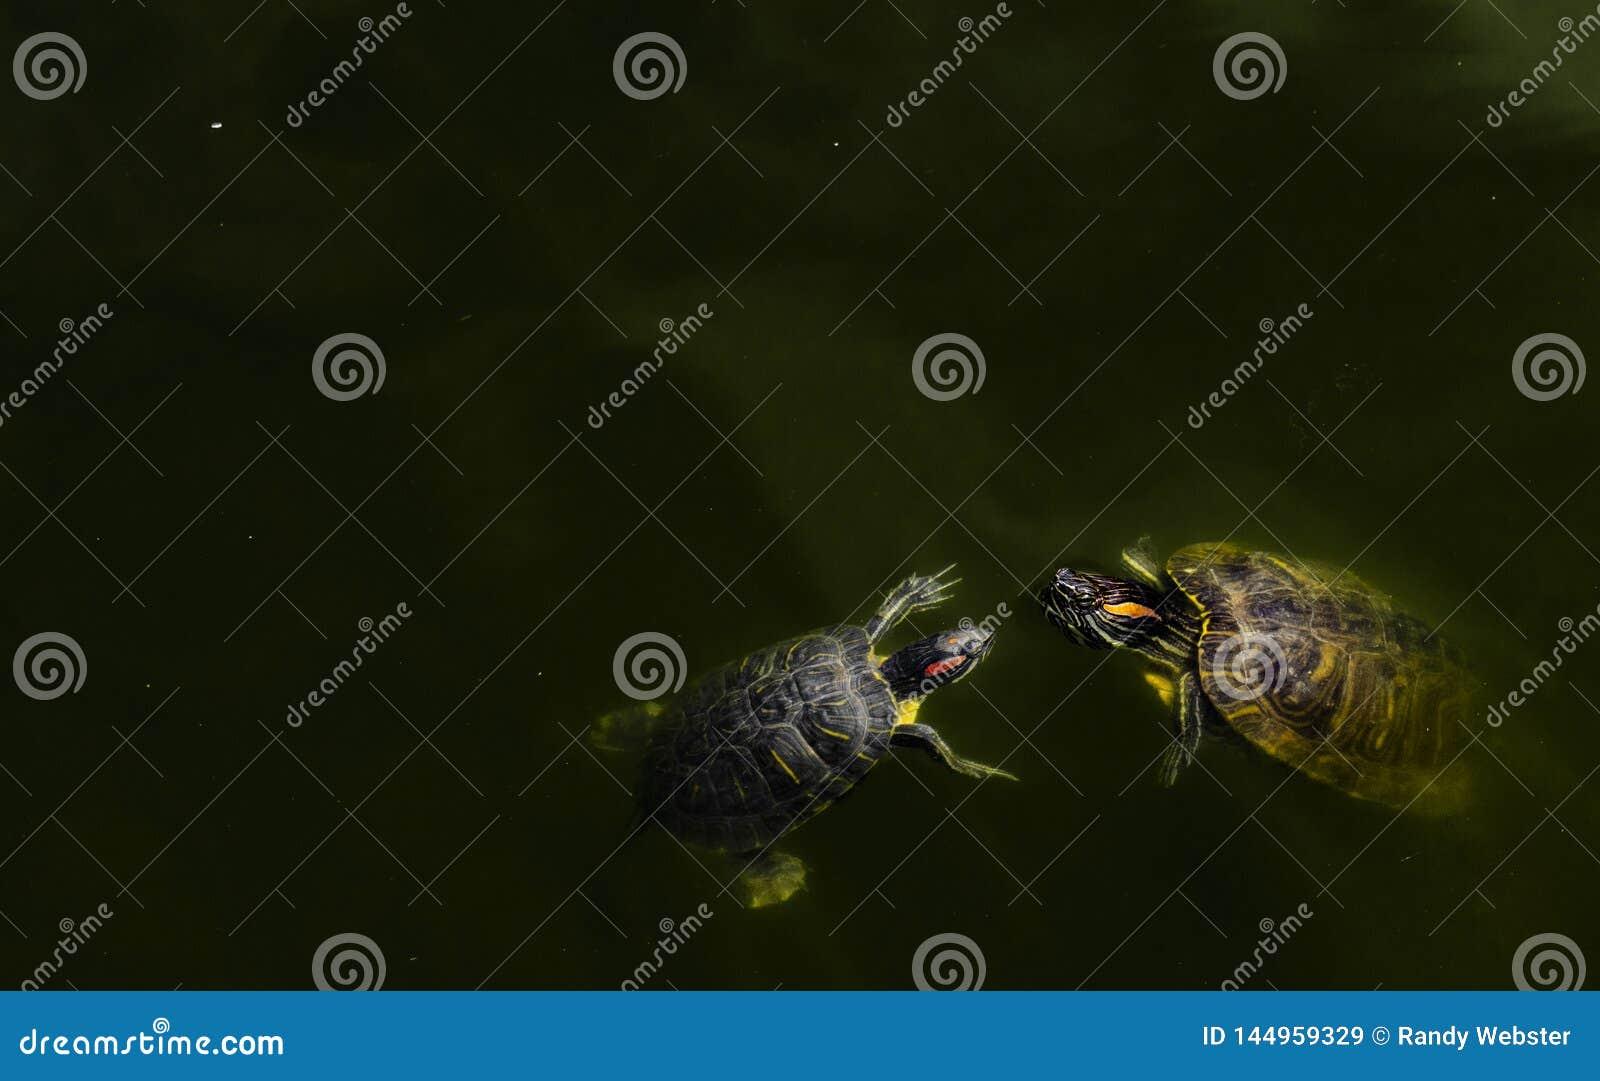 Tartaruga em uma lagoa com peixes